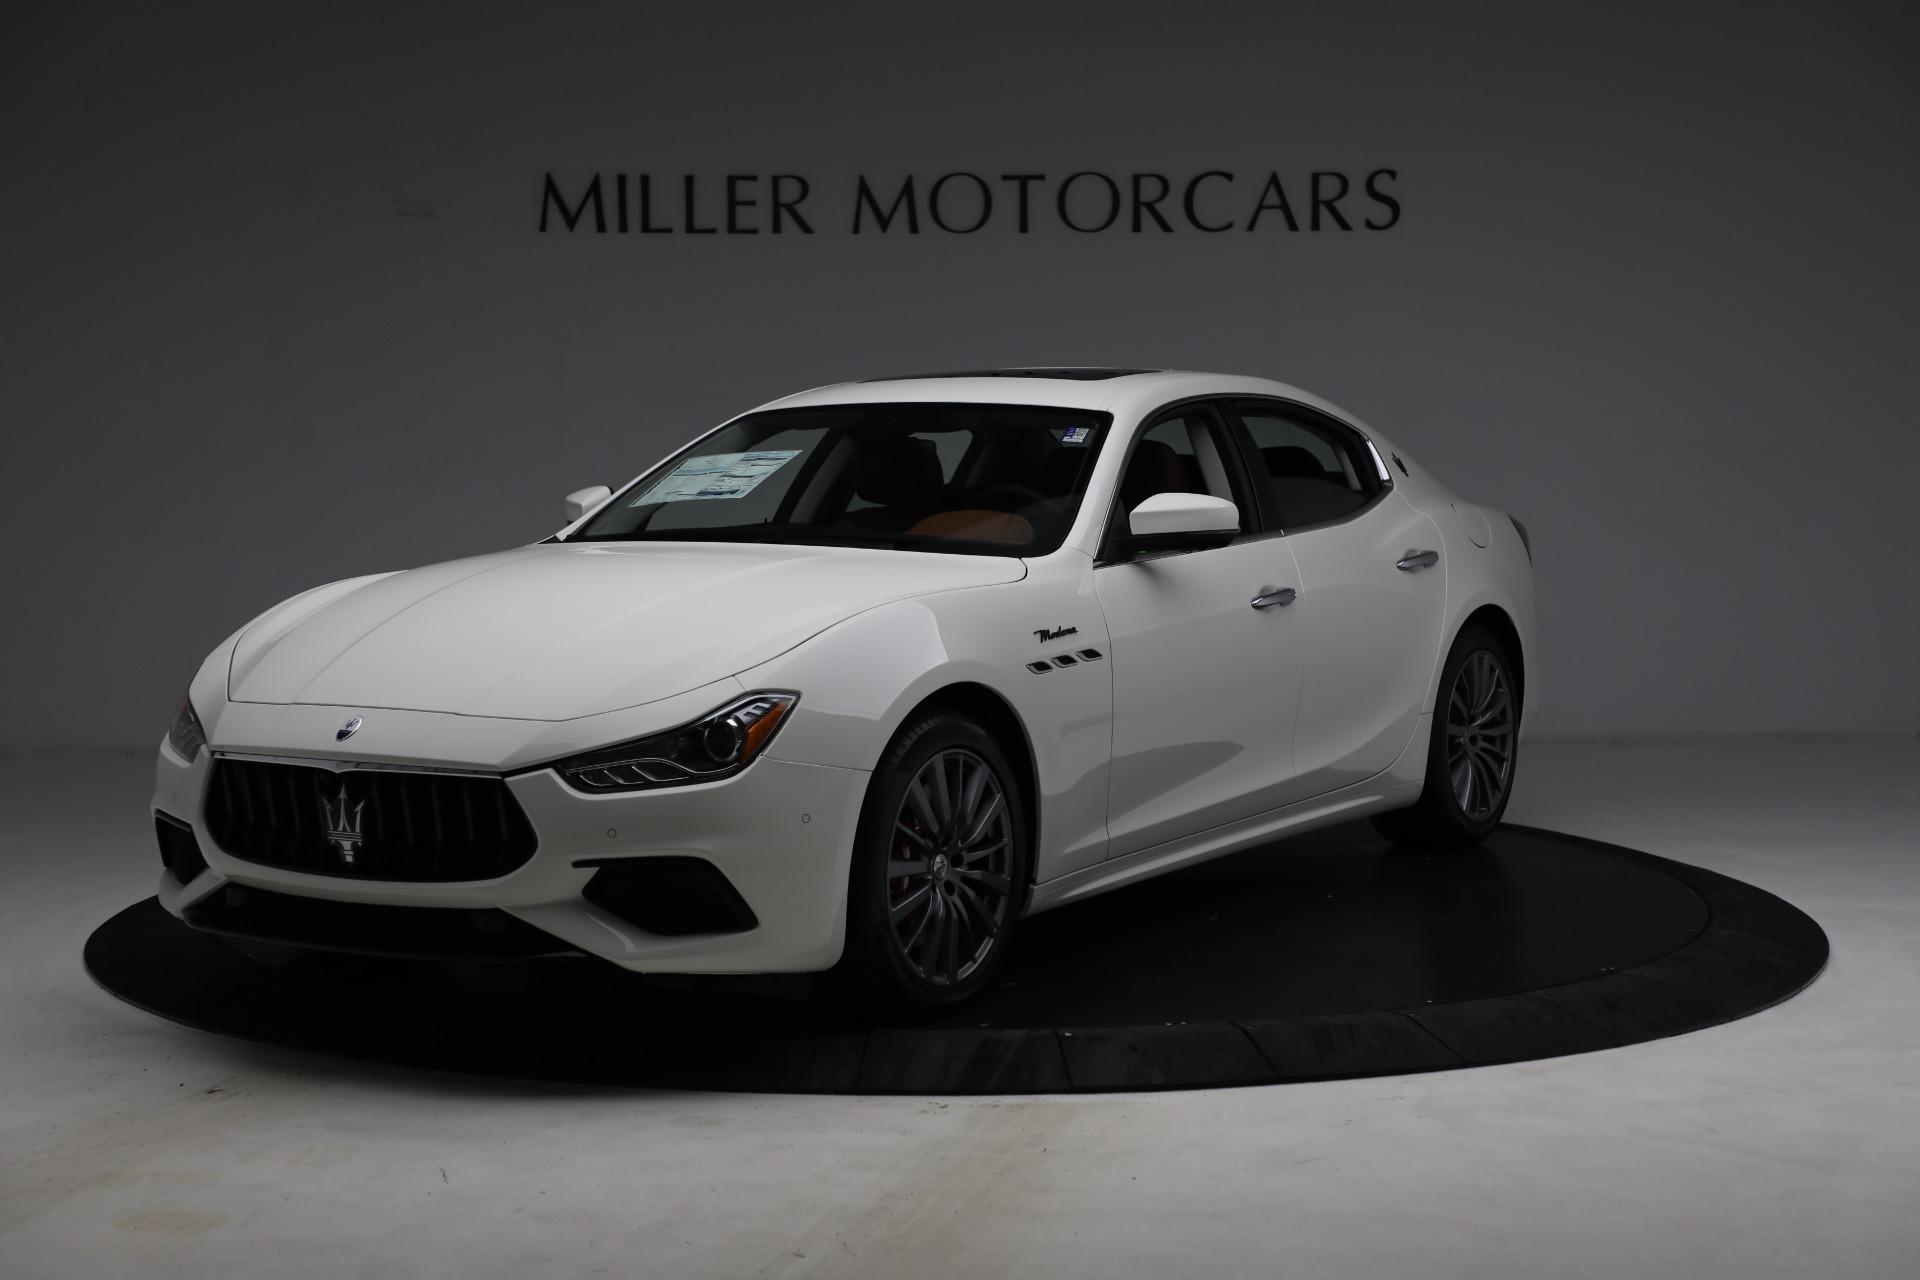 New 2022 Maserati Ghibli Modena Q4 for sale $86,645 at Bentley Greenwich in Greenwich CT 06830 1